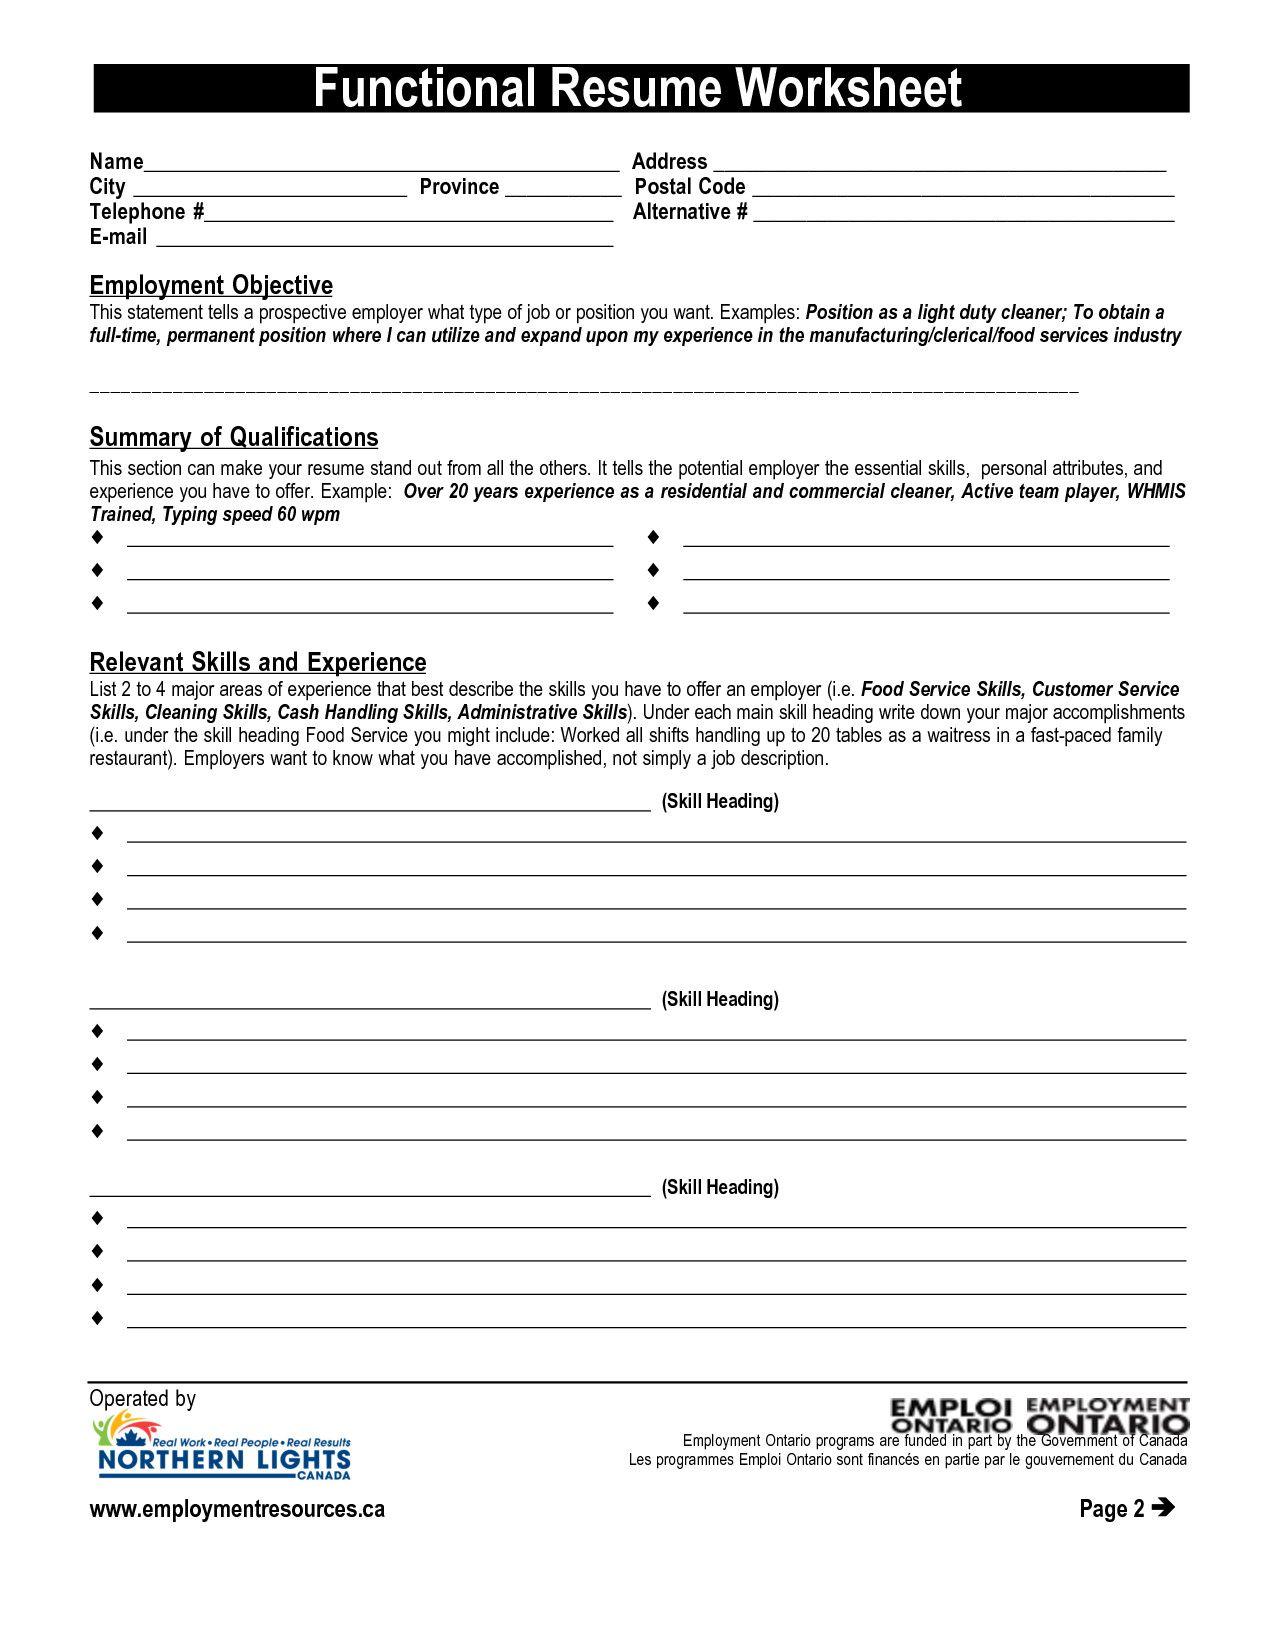 High school resume workbook essays about school discipline